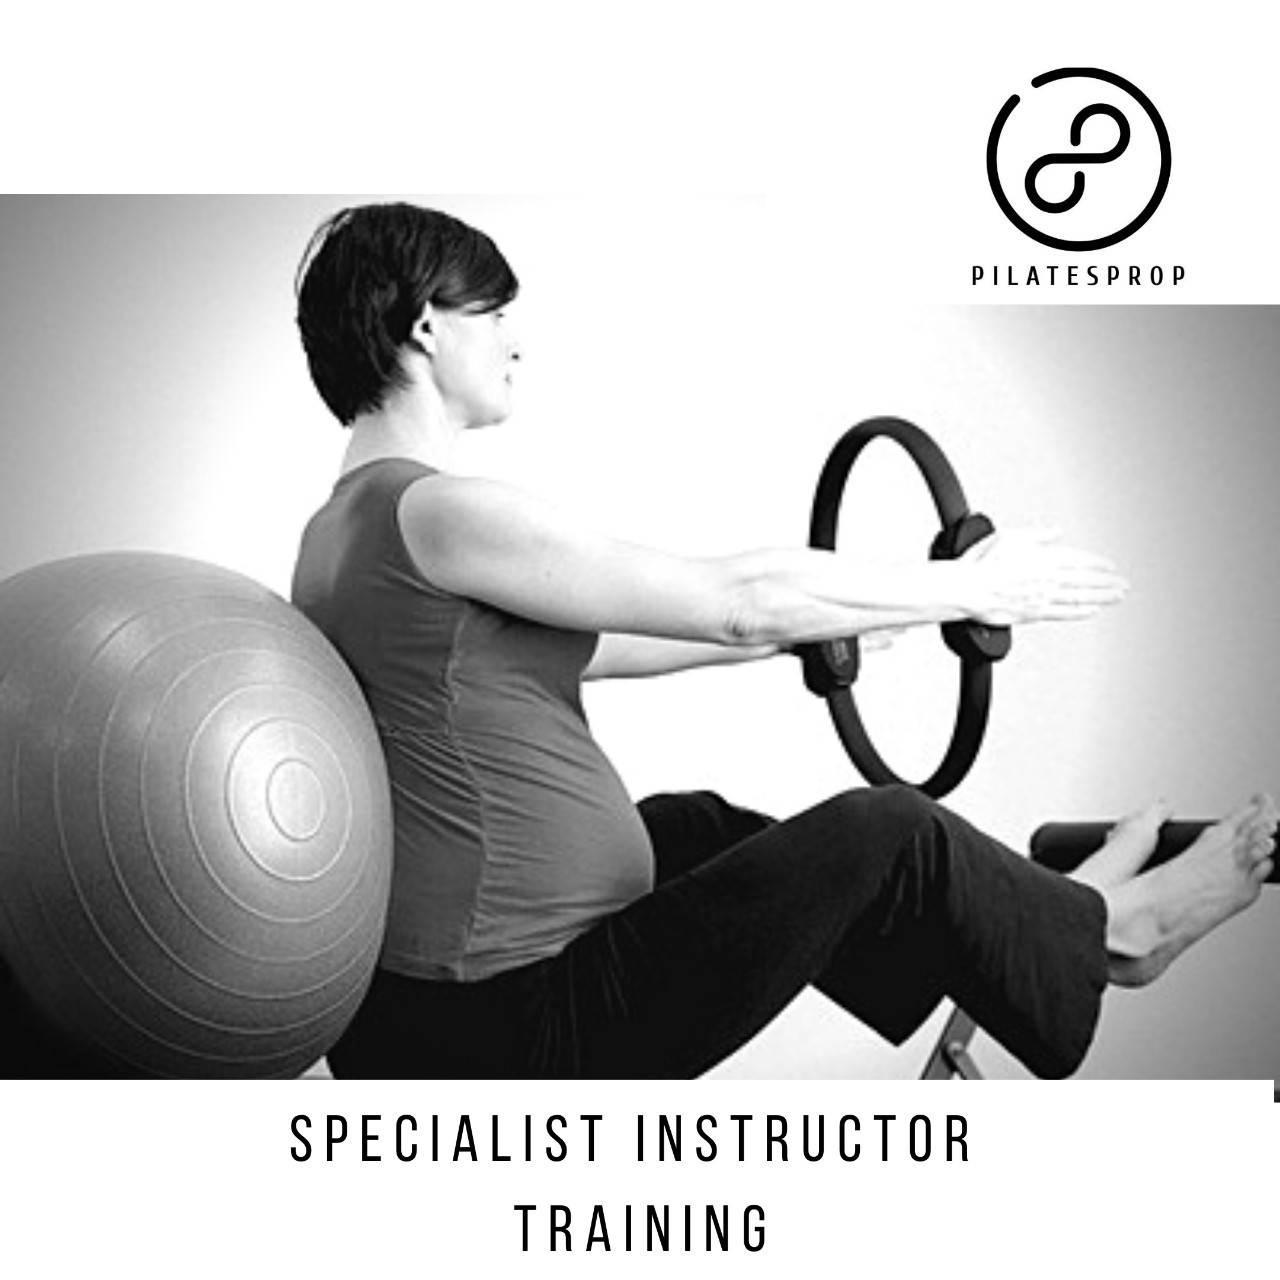 Specialist Instructor Training